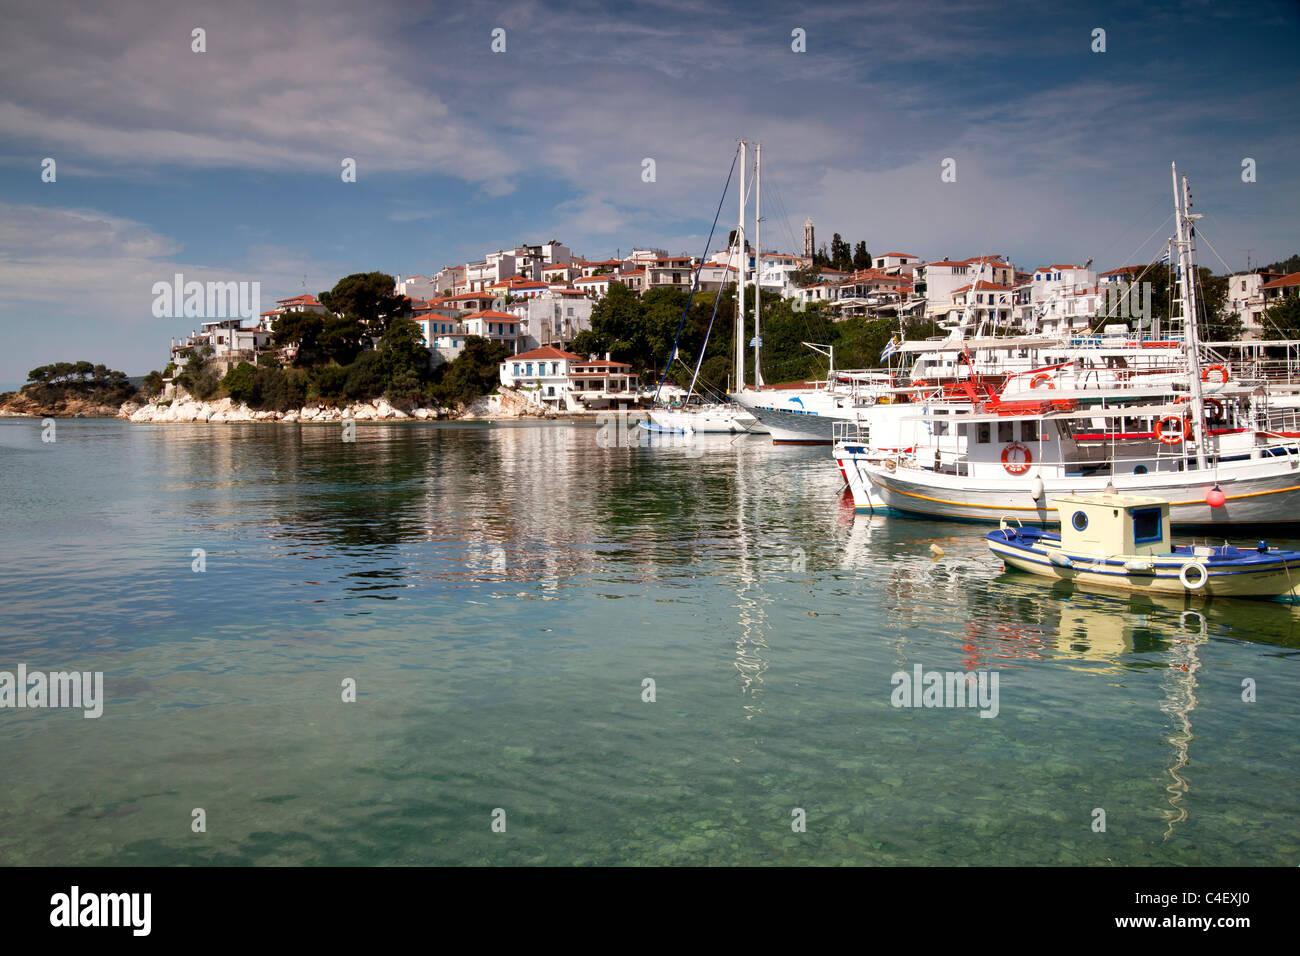 cityscape and old harbour Skiathos Town on Skiathos Island, Northern Sporades, Greece Stock Photo